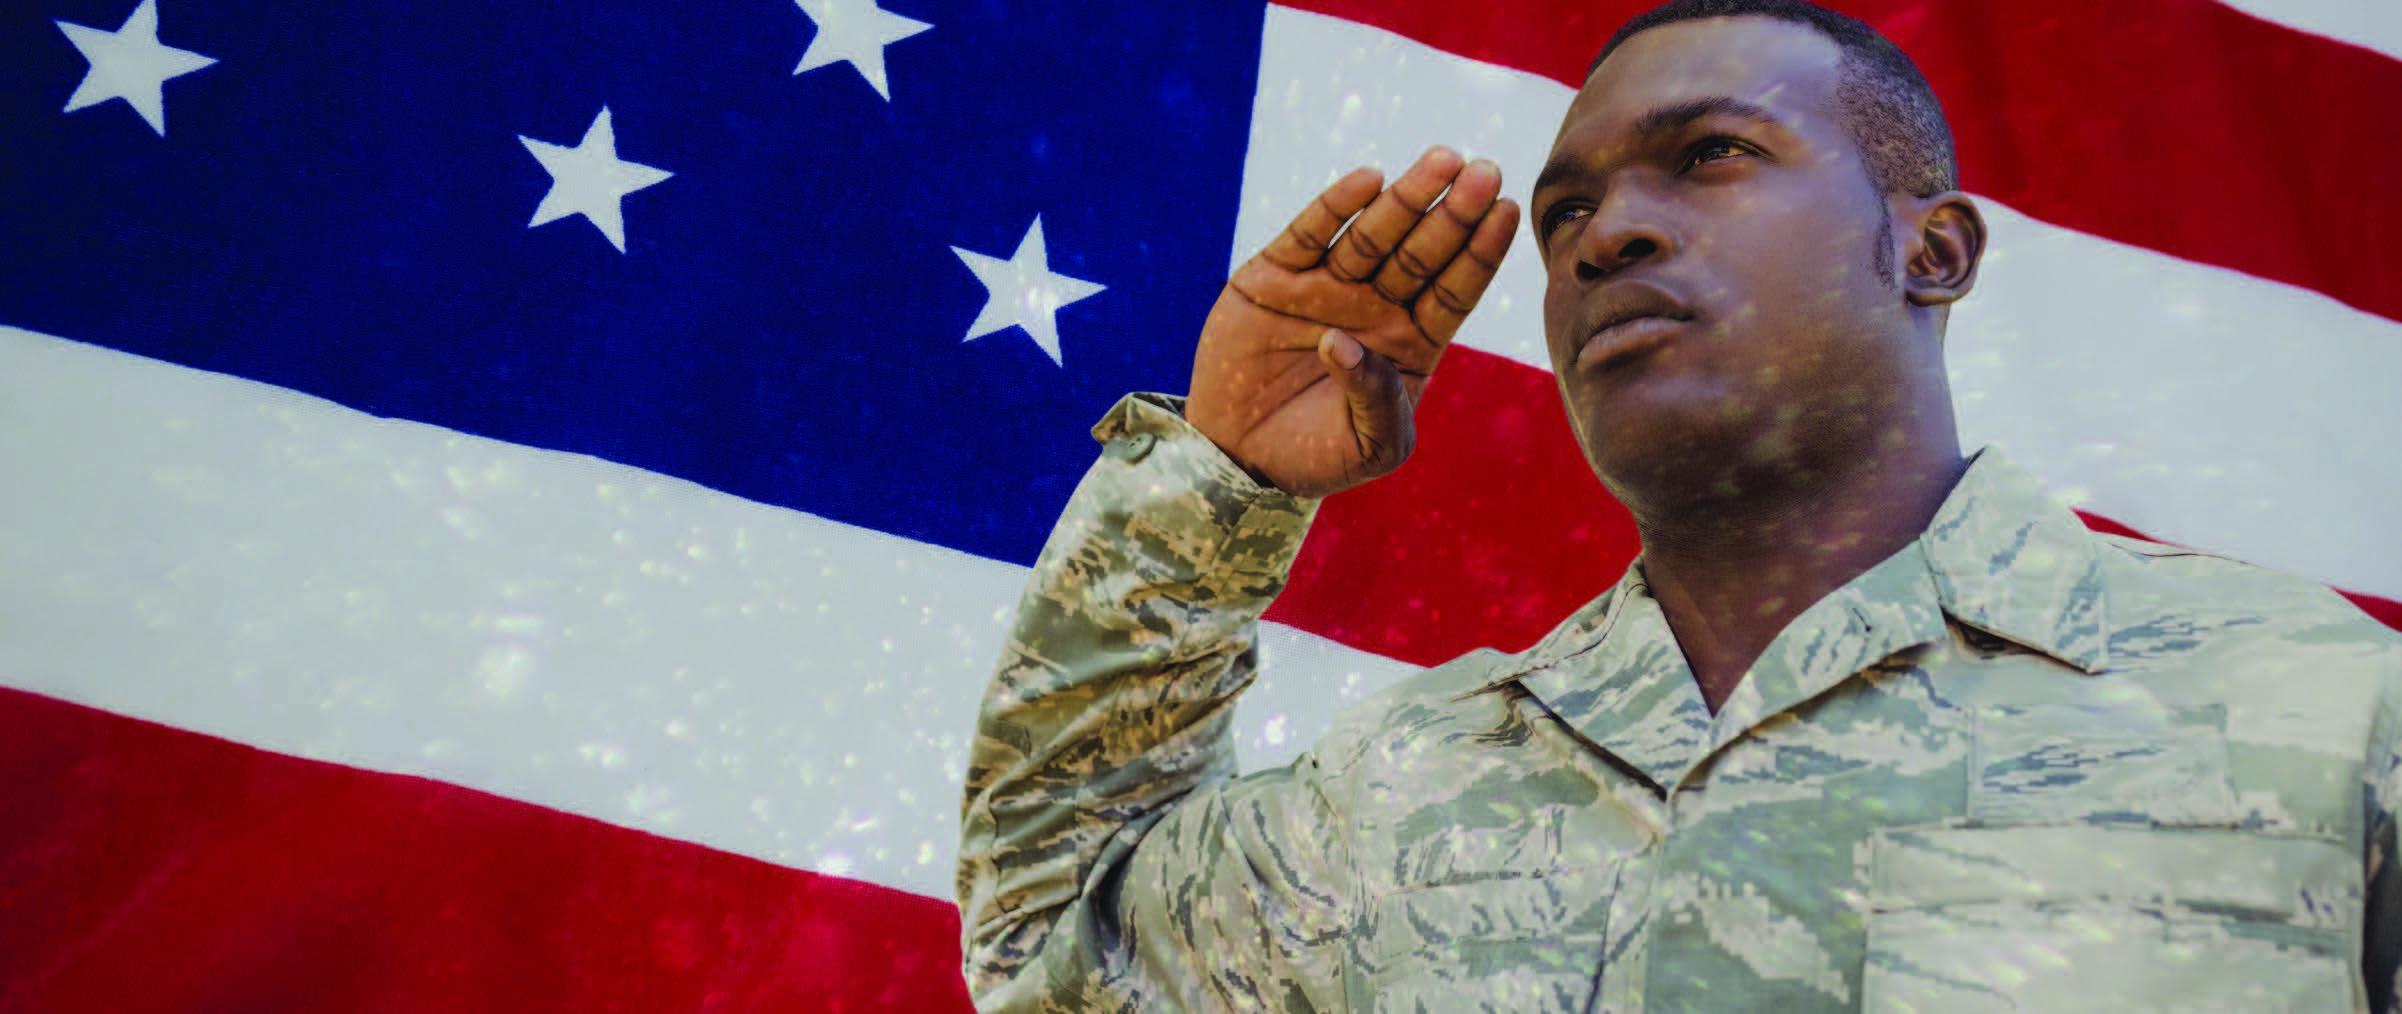 5 Star Veterans